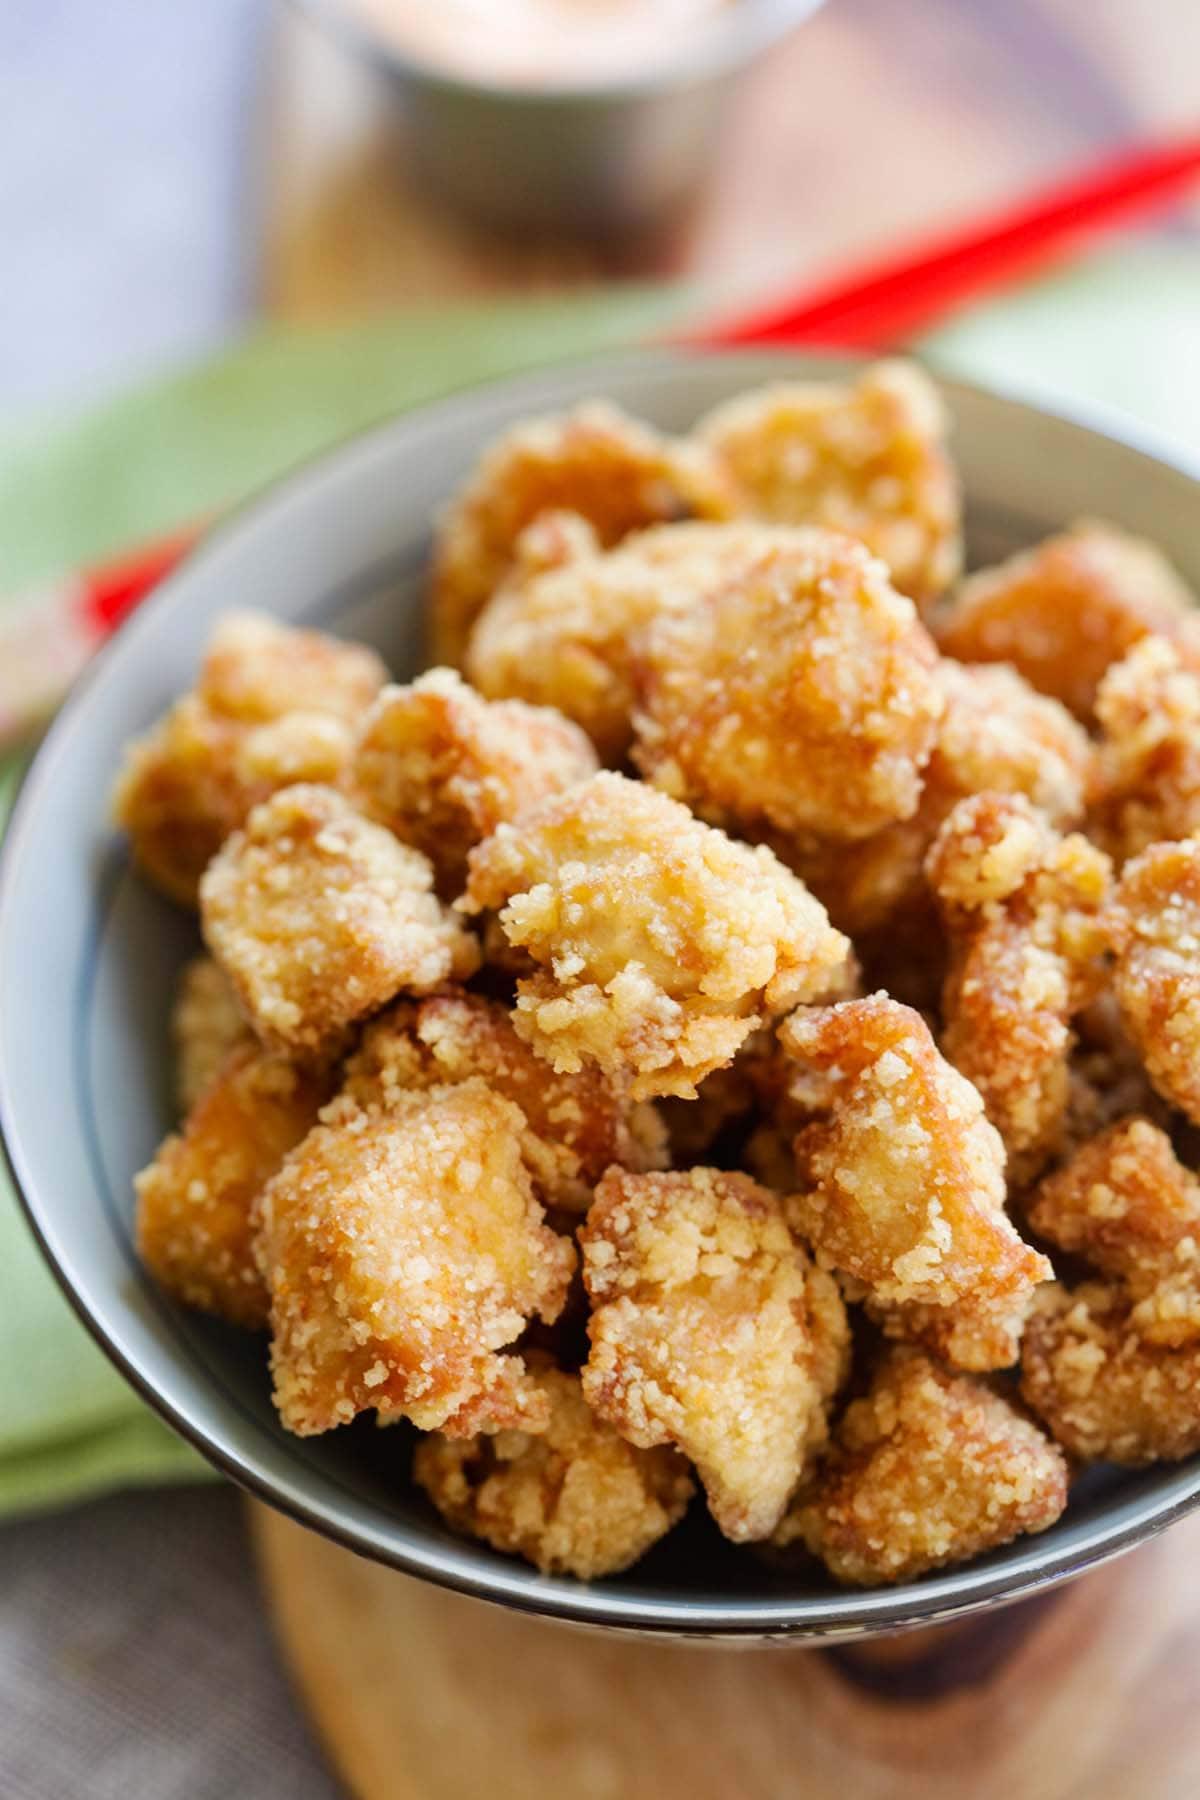 How to make chicken karaage.